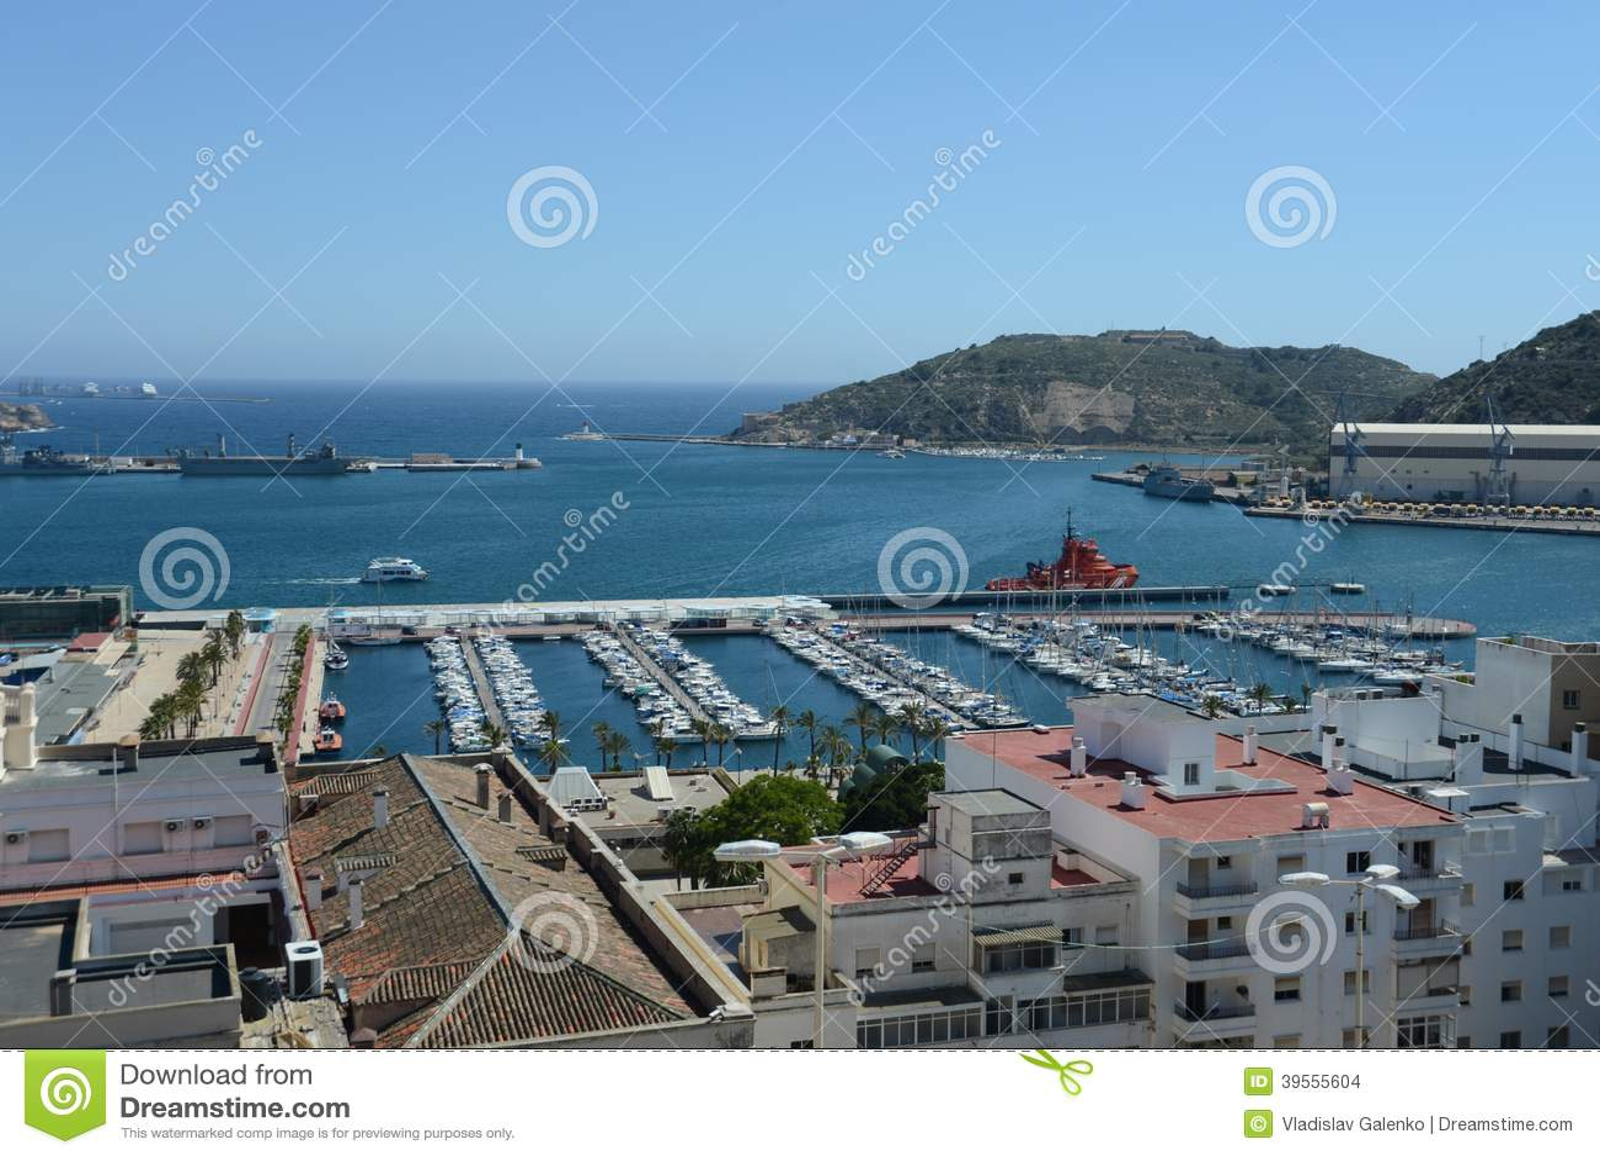 the port of cartagena spain stock photo image of mediterranean